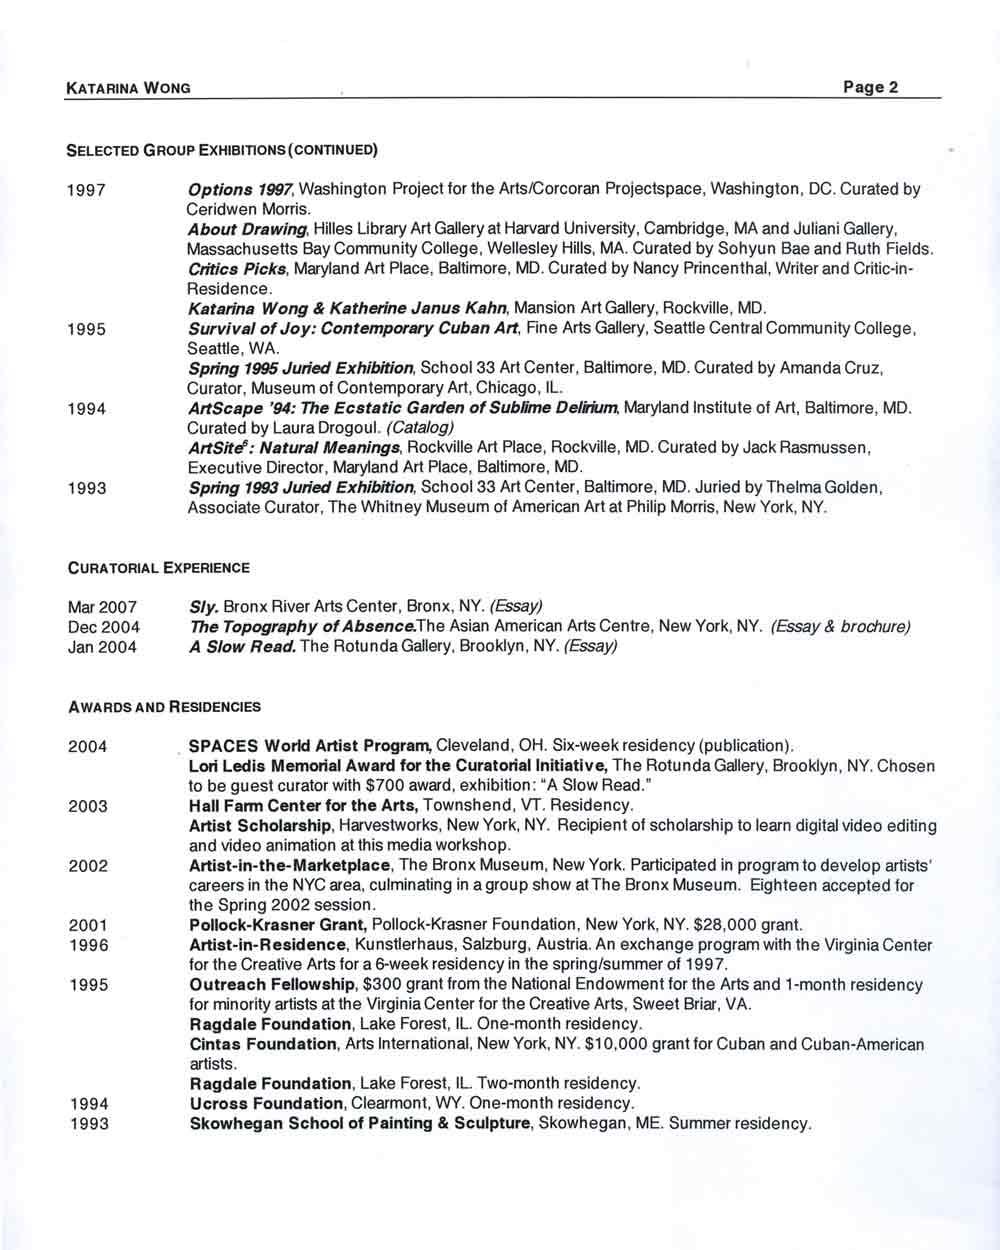 Katarina Wong's Resume, pg 2